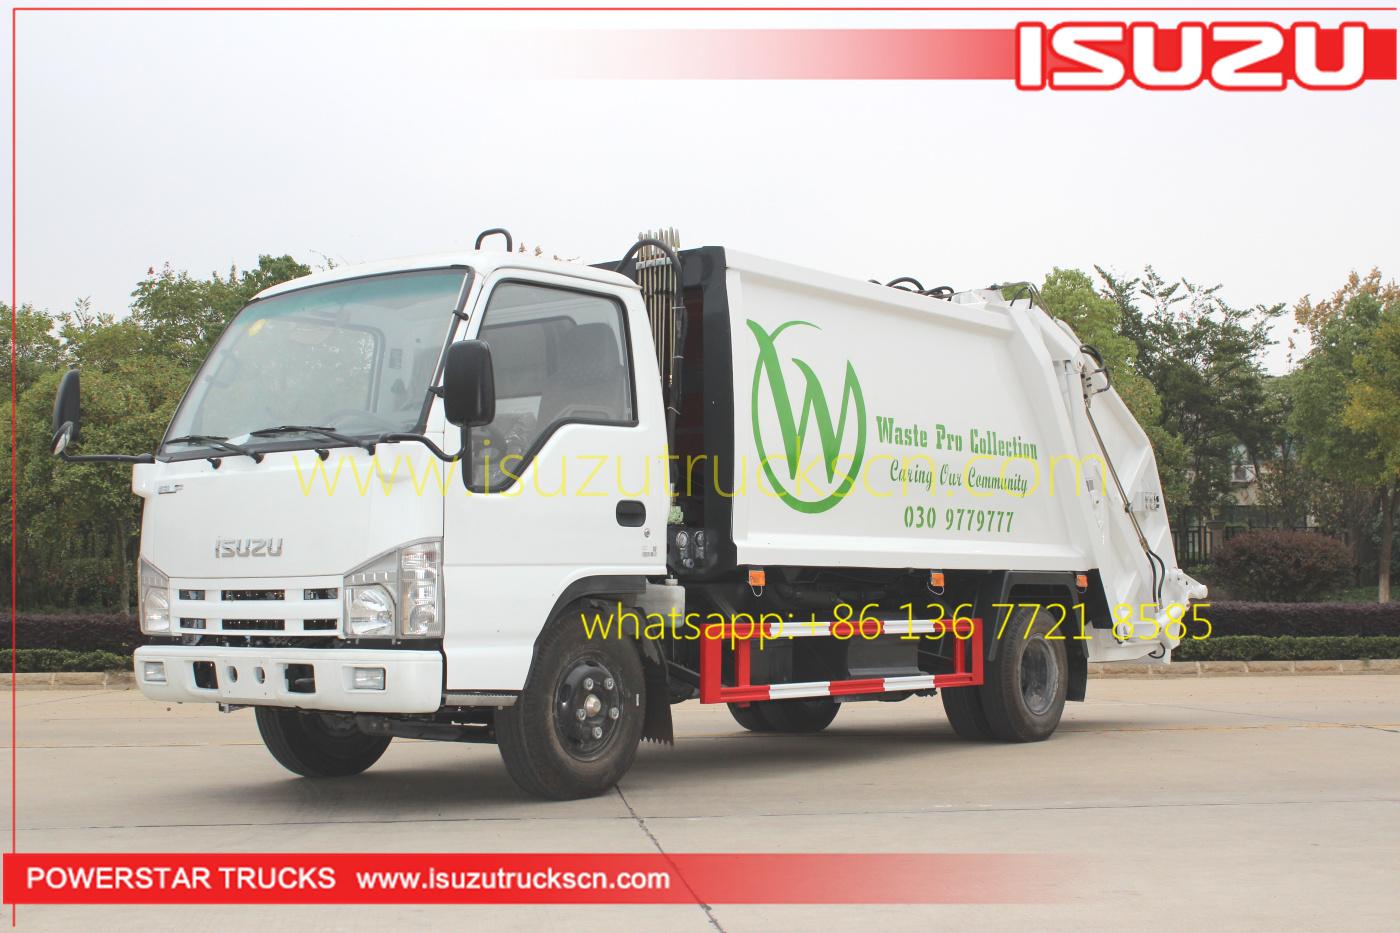 Compression Garbage Truck Isuzu 4 Cbm At Price Concessions